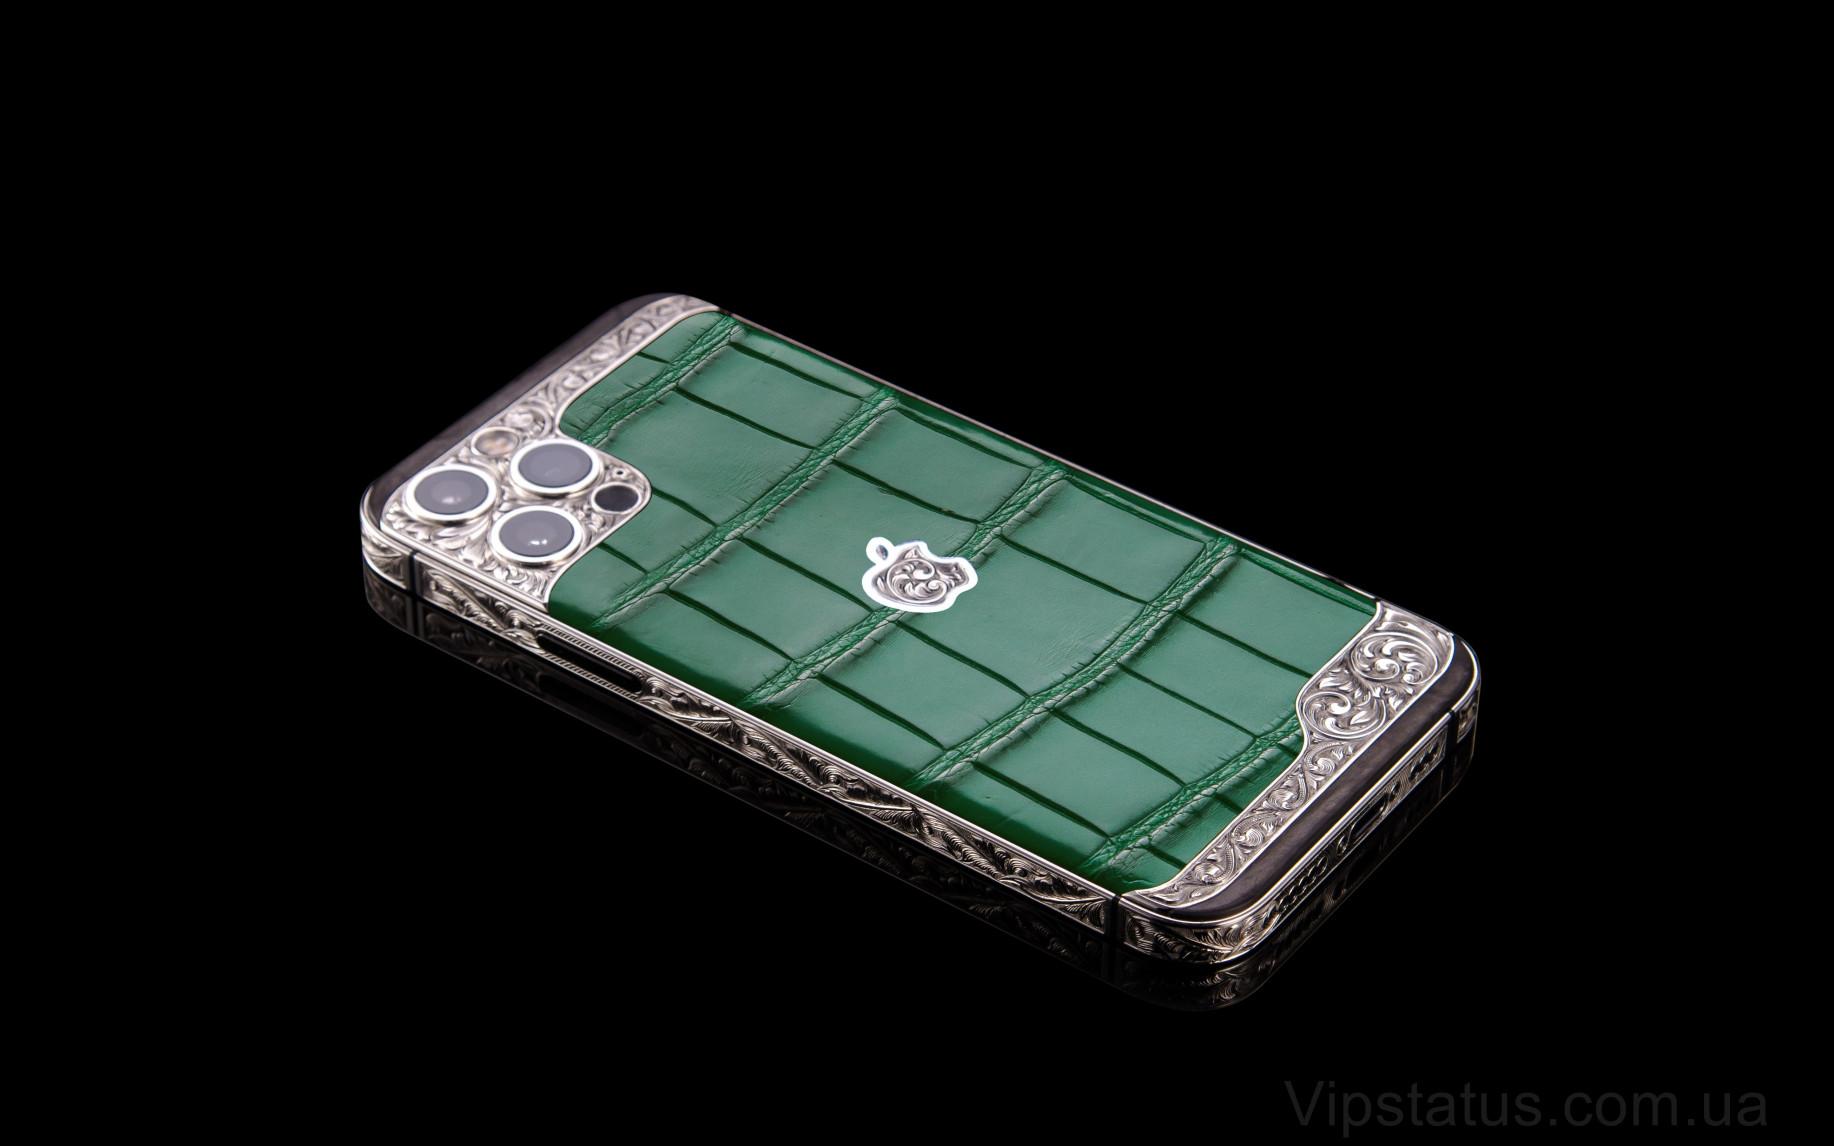 Elite Green Power Edition IPHONE 12 PRO MAX 512 GB Green Power Edition IPHONE 12 PRO MAX 512 GB image 7